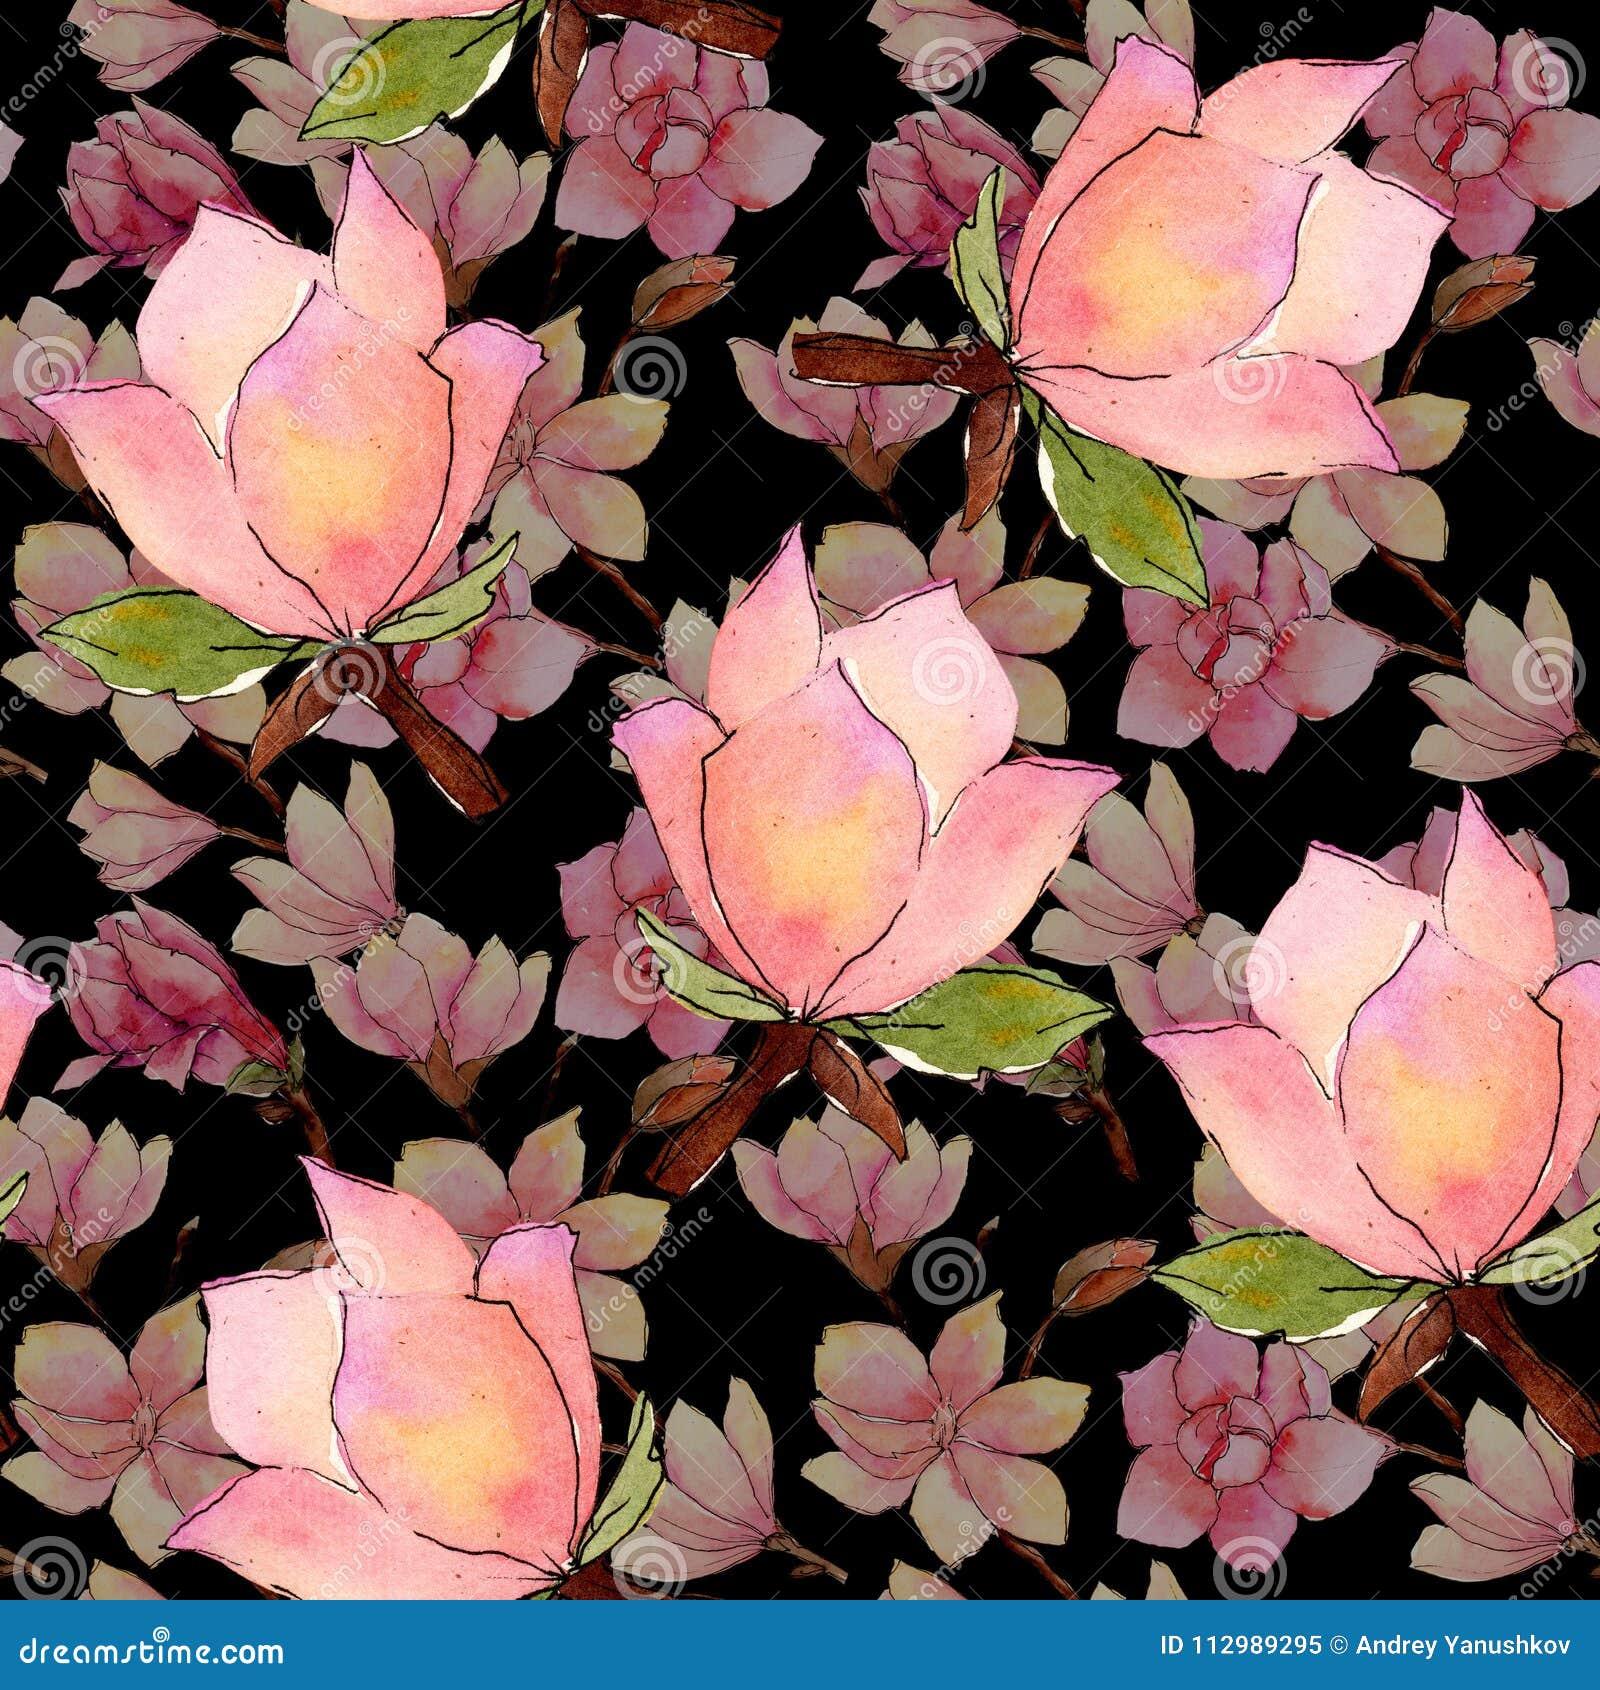 Wildflower magnolia flower pattern in a watercolor style.